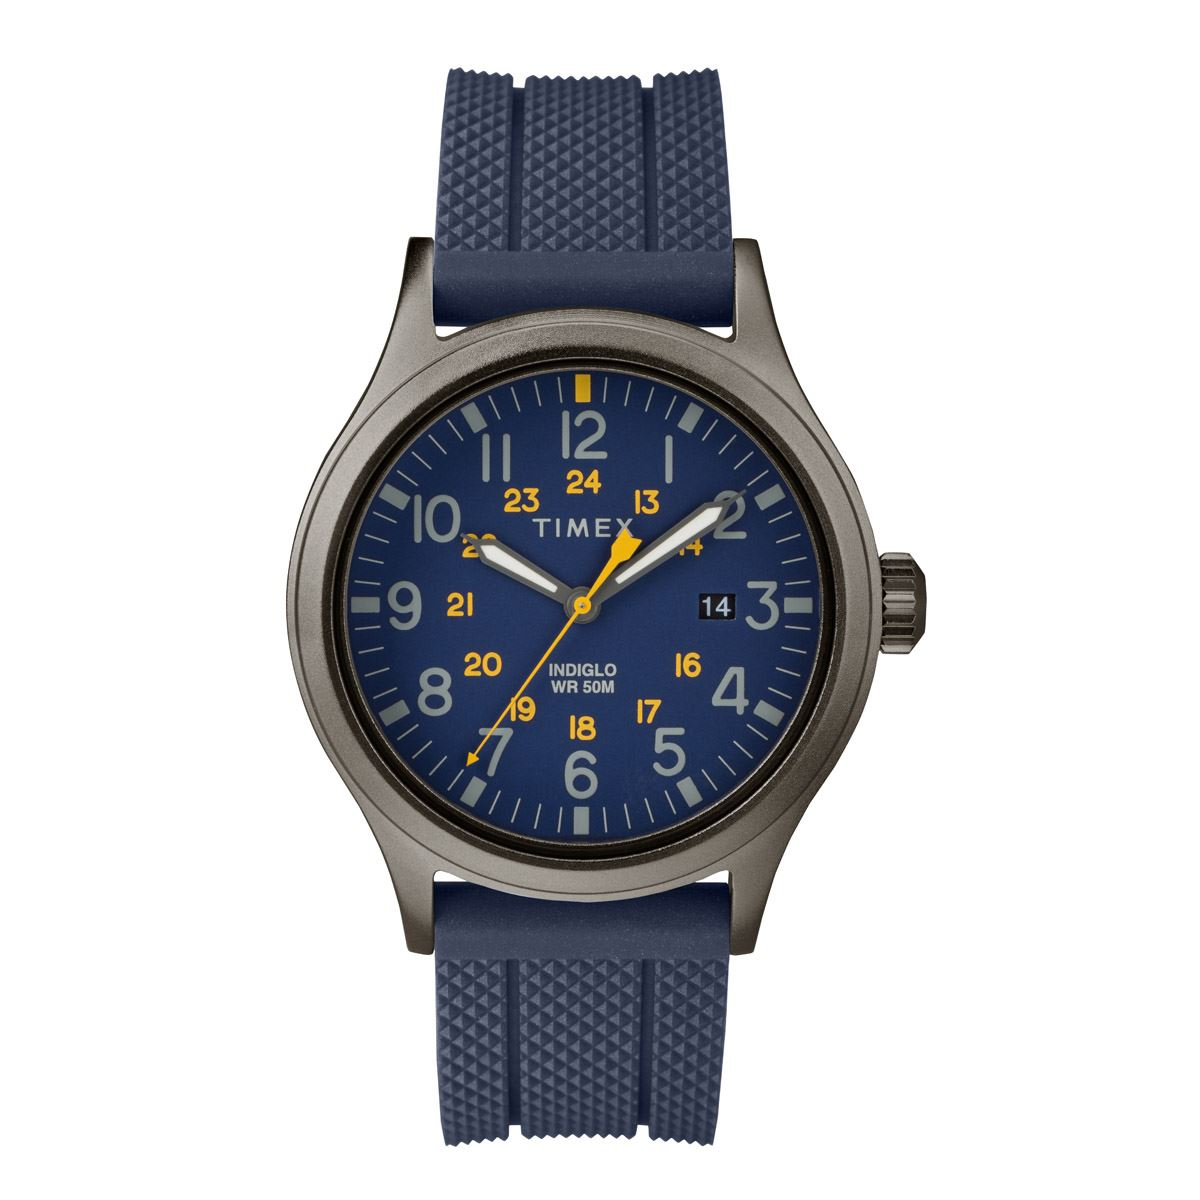 58c052867208 Reloj Timex TW2R61100 Caballero Fashion